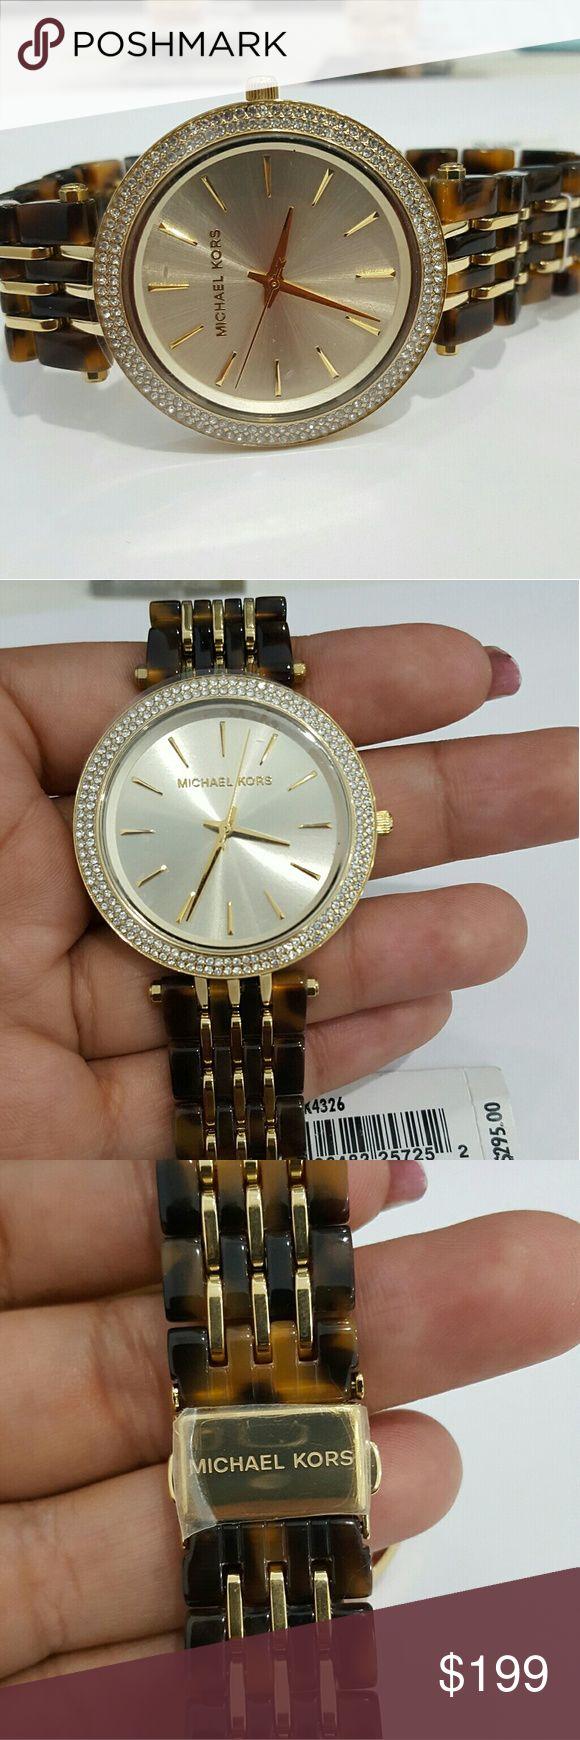 New Michael Kors mk4326 ladies watch Gold tone mk4326 Michael kors watch new with tags and warrenty. Michael Kors Accessories Watches